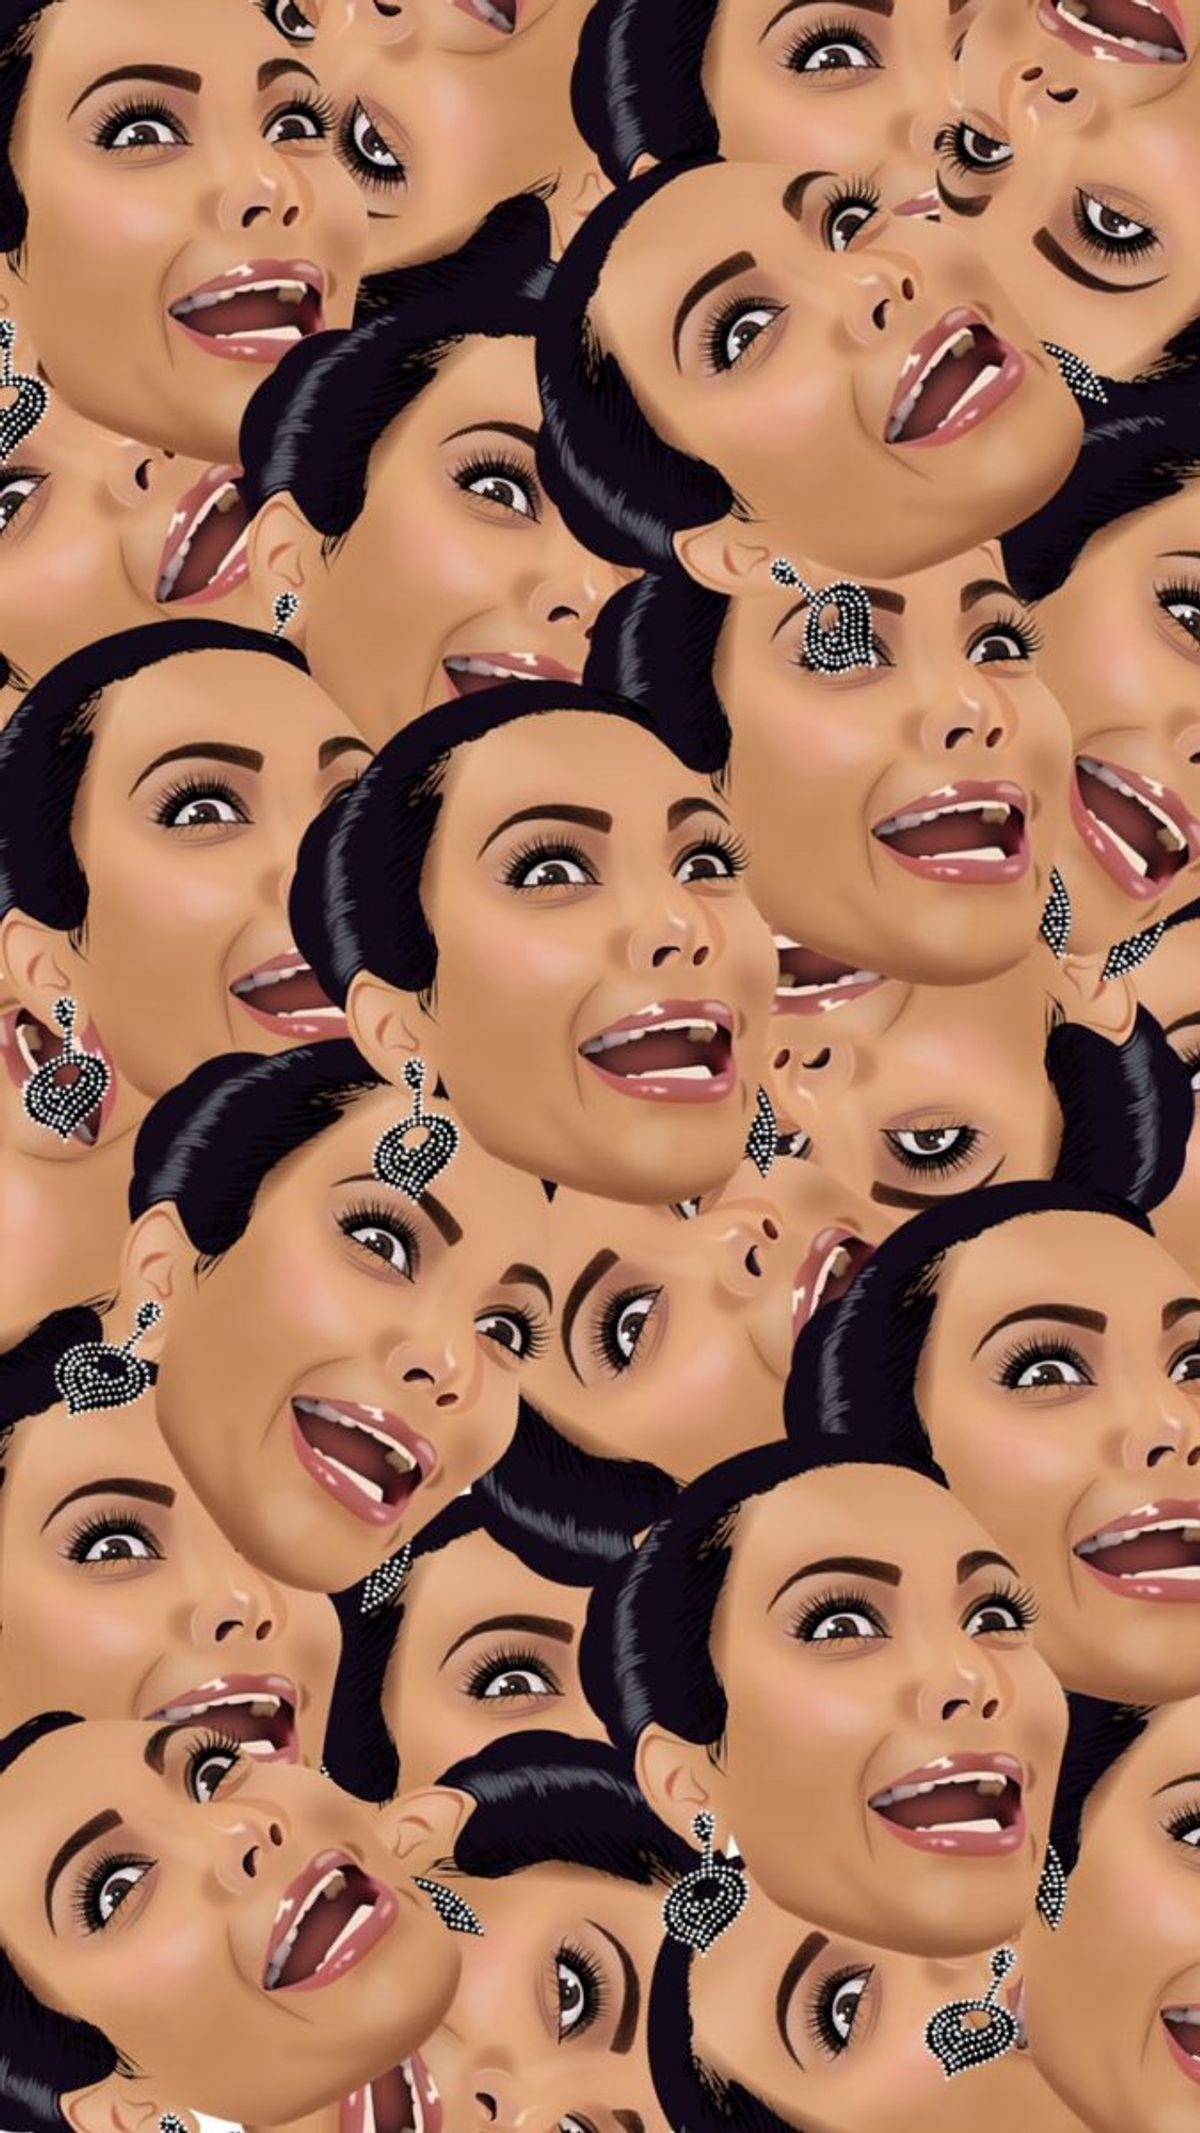 College Life As Told By Kim Kardashian GIF's